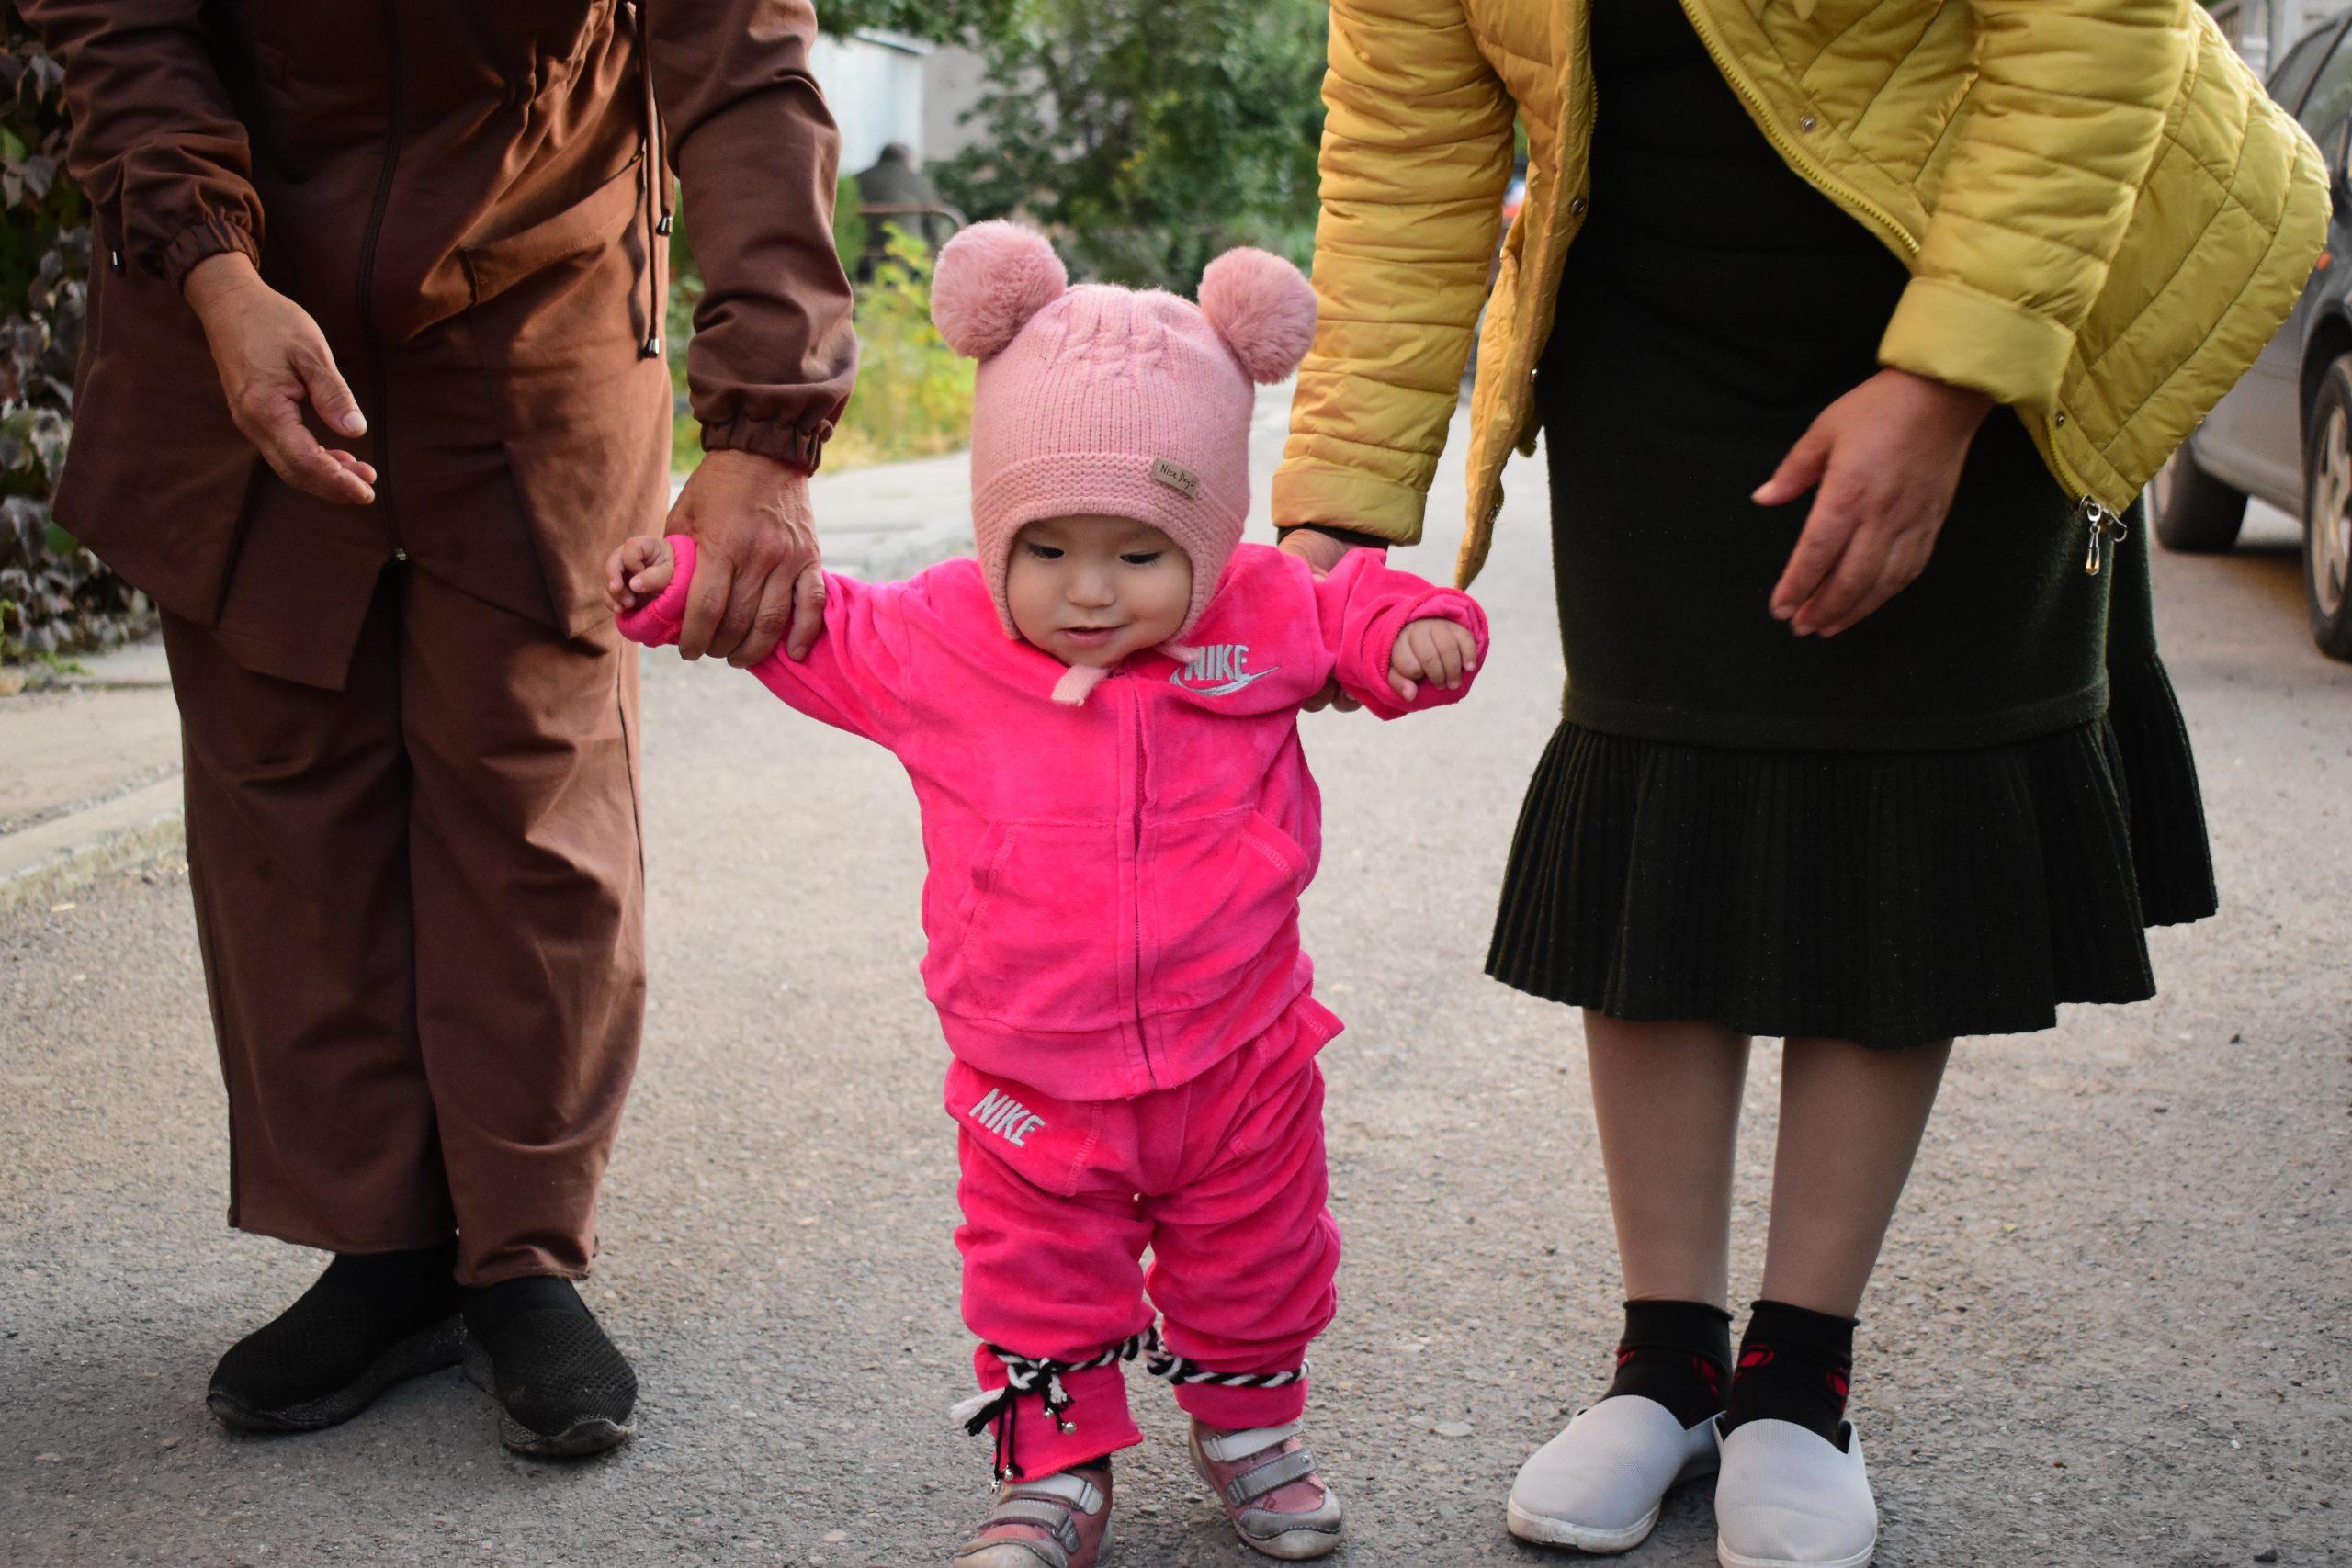 Тушоо кесуу: обряд, помогающий ребенку идти по жизни смело